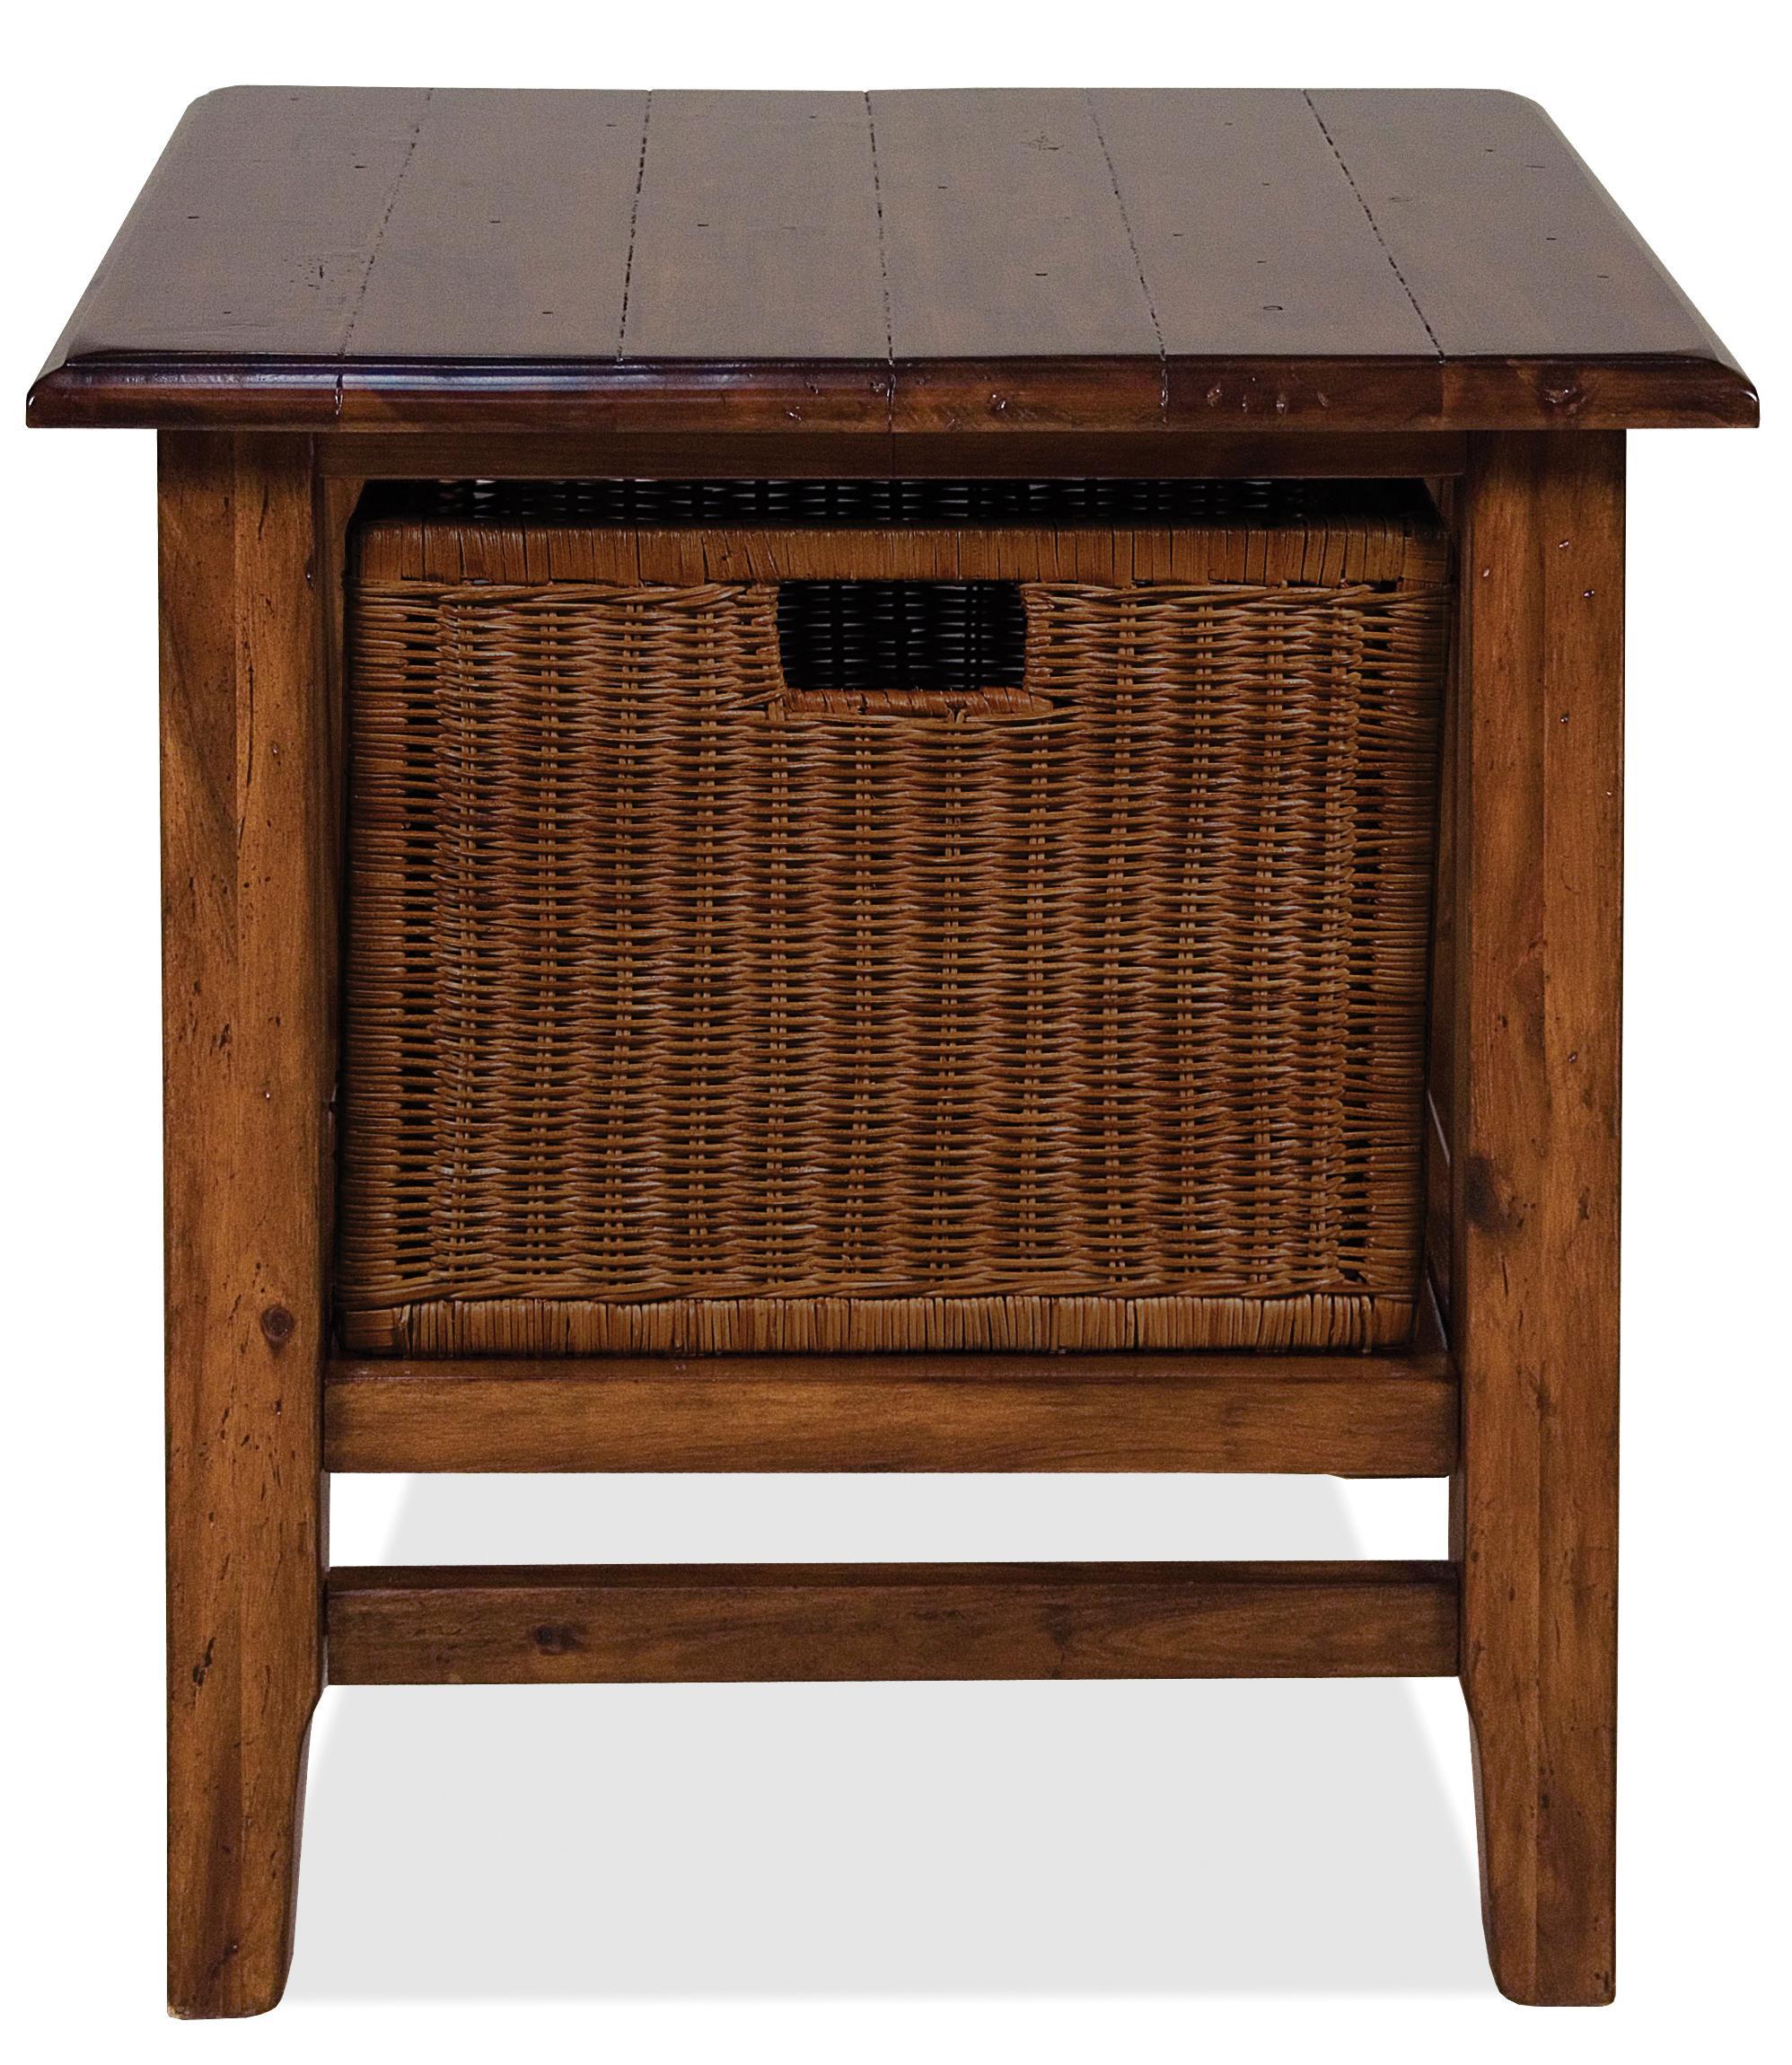 Lovely Riverside Furniture Claremont Rectangular End Table With Storage Basket   Hudsonu0027s  Furniture   End Table